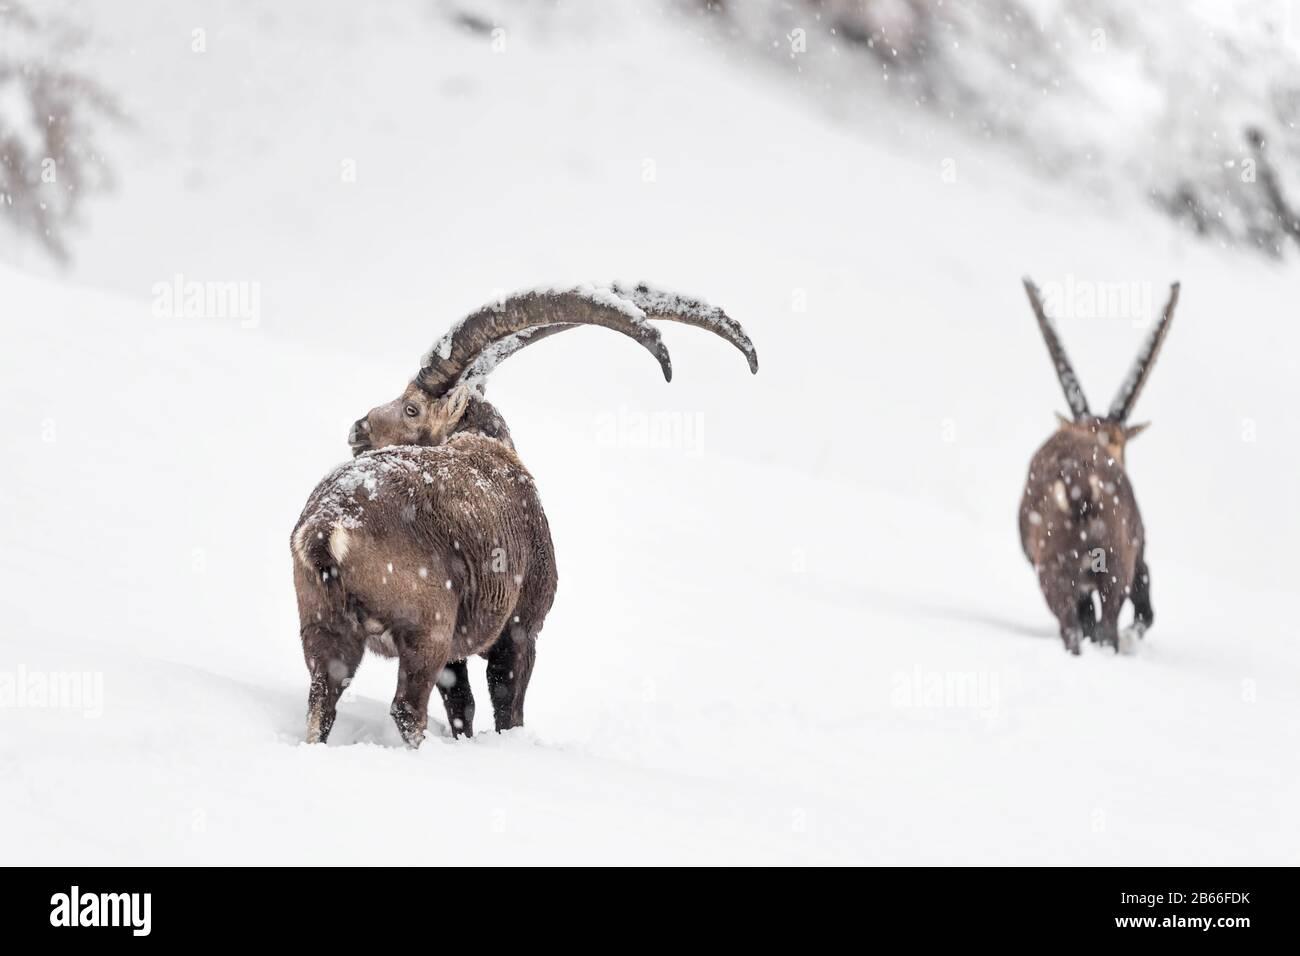 Steinböcke unter Schneesturm (Capra Ibex) Stockfoto